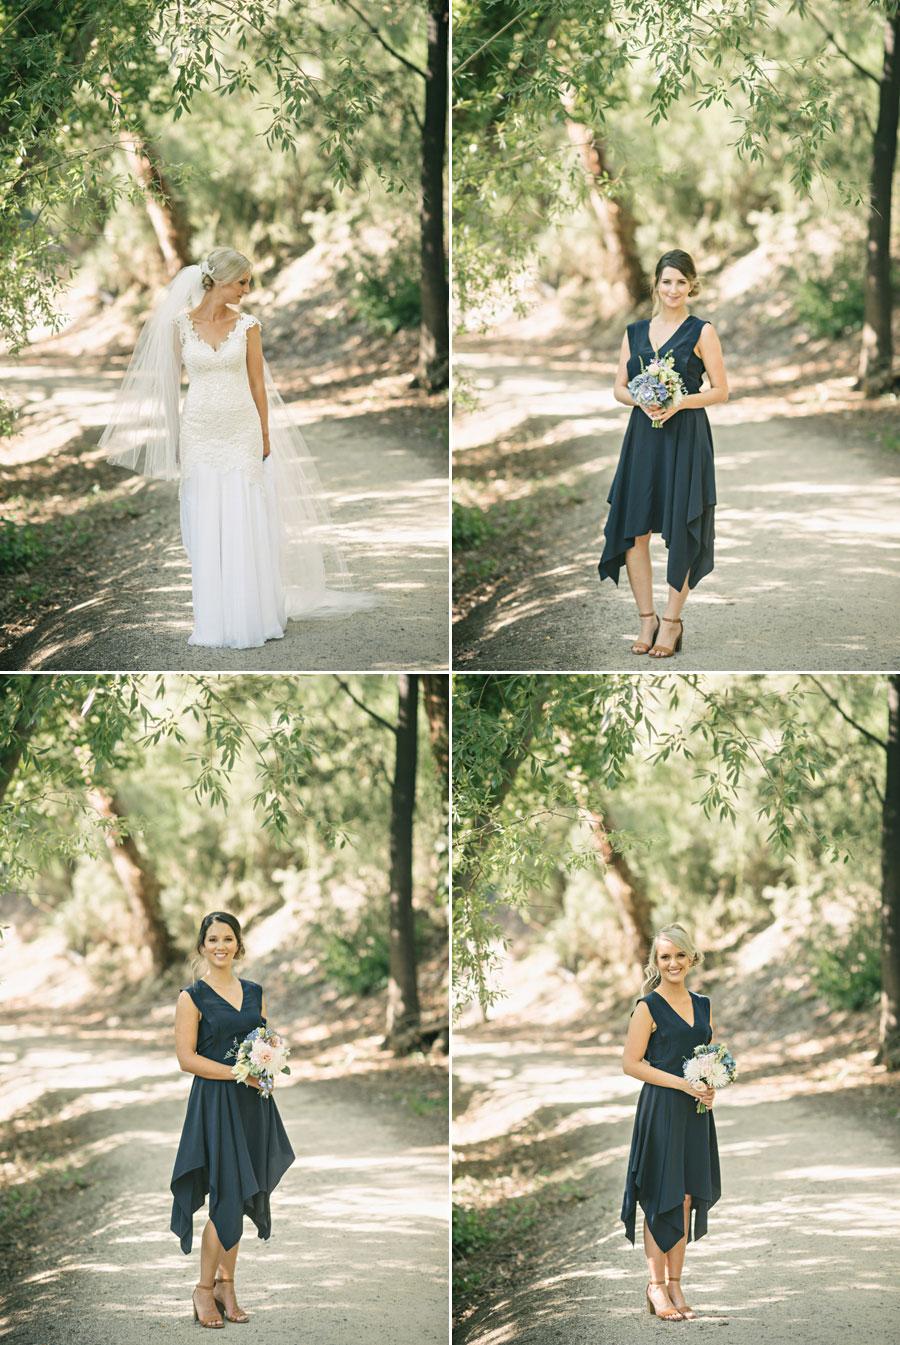 wedding-the-convent-dayelsford-victoria-louise-giles-047.jpg